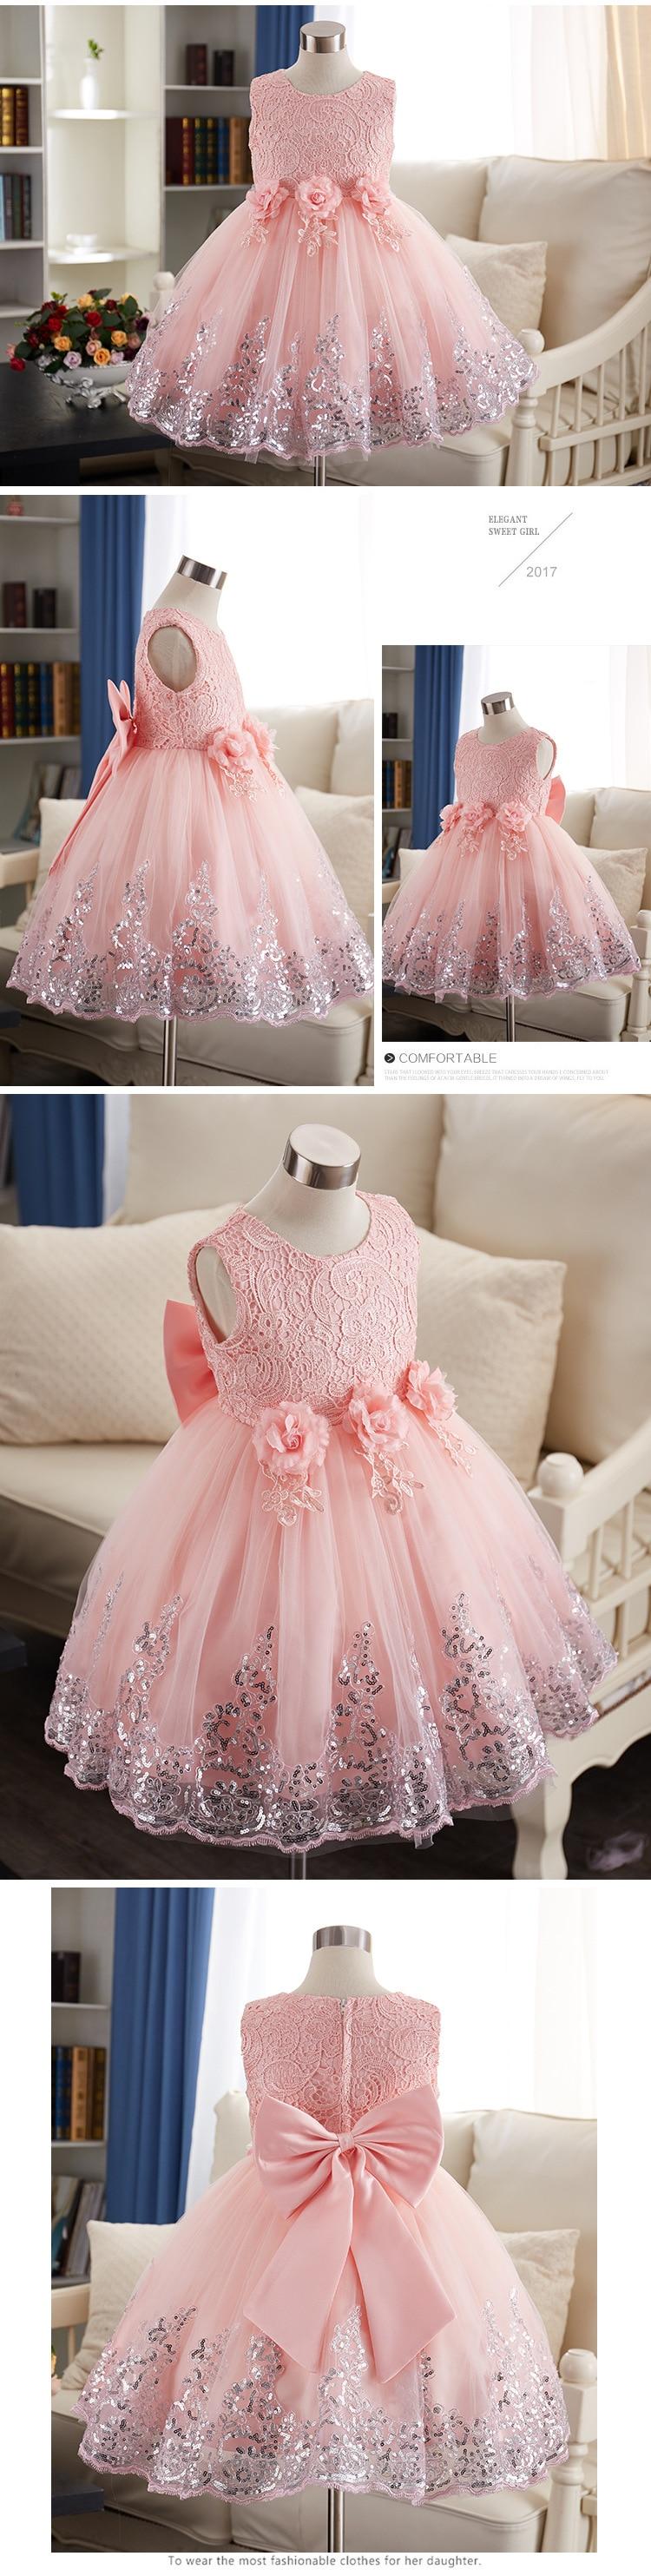 HTB1rfRZcL5TBuNjSspmq6yDRVXas Girls Dress Christmas Elegant Princess Dress Kids Dresses For Girl Costume Children Wedding Party Dress 10 Year vestido infantil